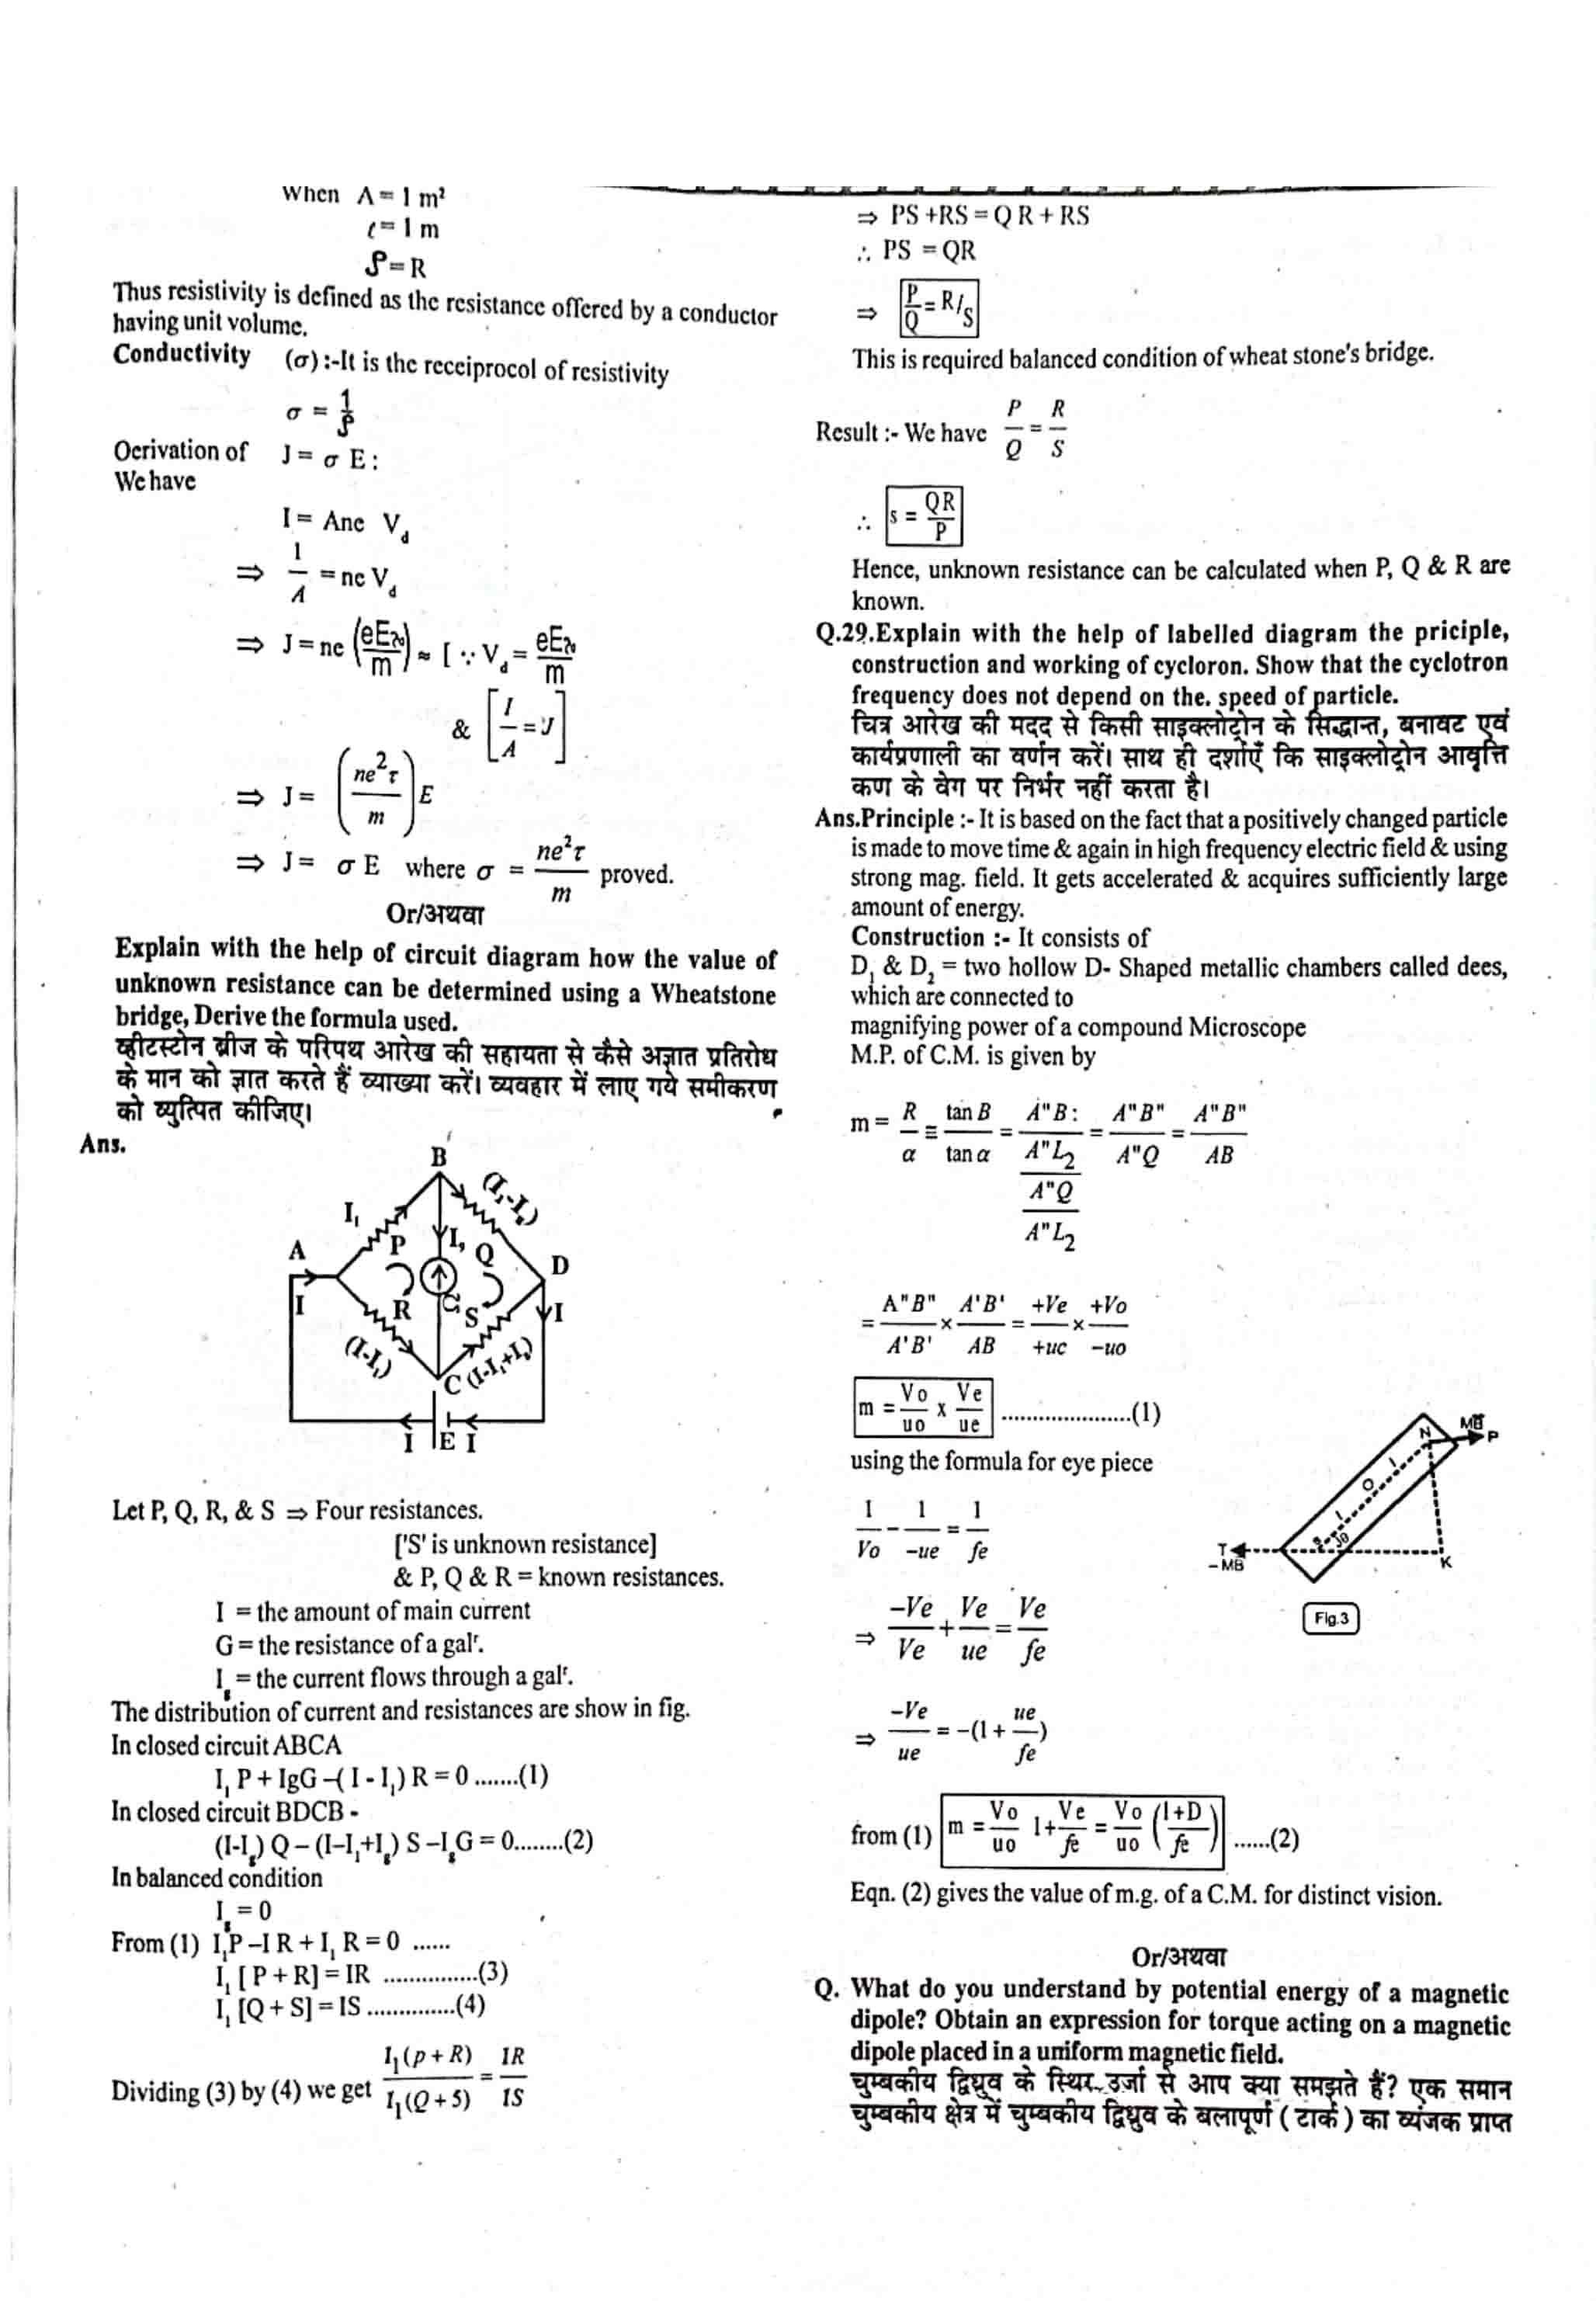 JAC Class 12 Physics 2012 Question Paper 04